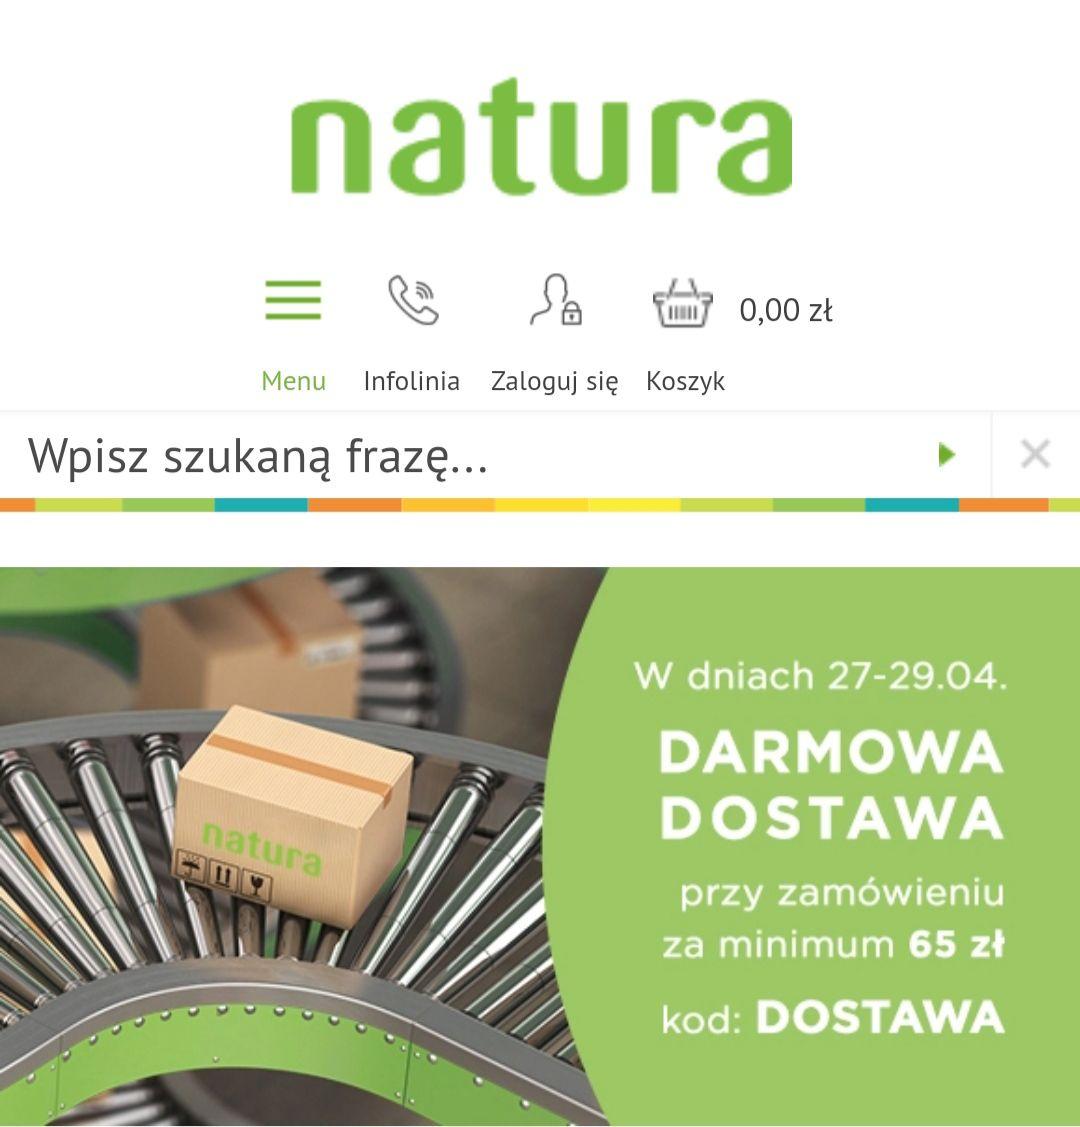 Natura - darmowa dostawa 27-29.04 minimum 65 zł